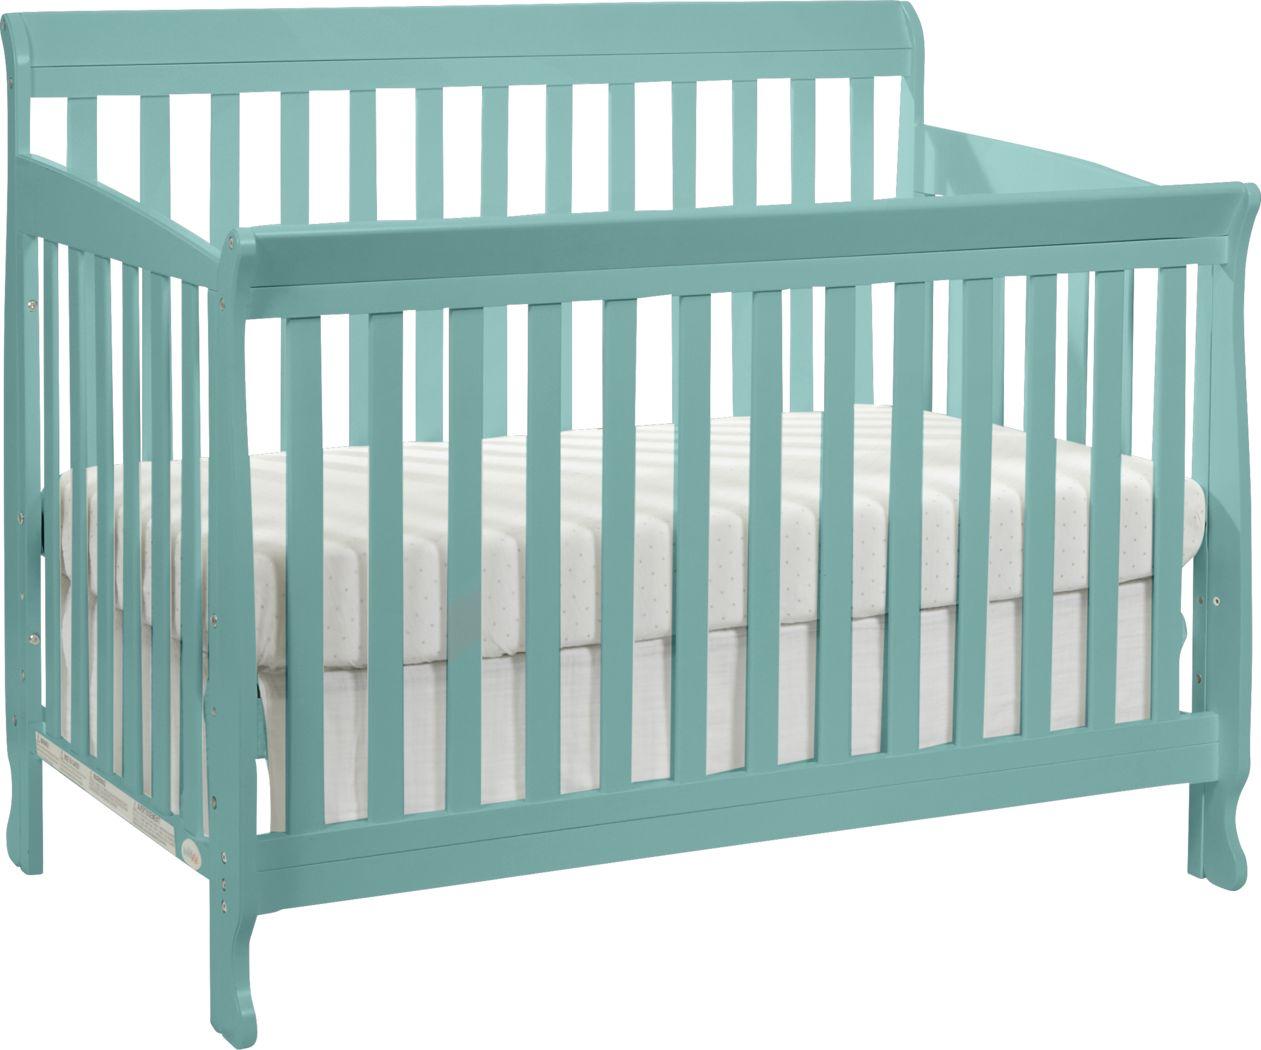 Reena Turquoise Convertible Crib with Toddler Rail